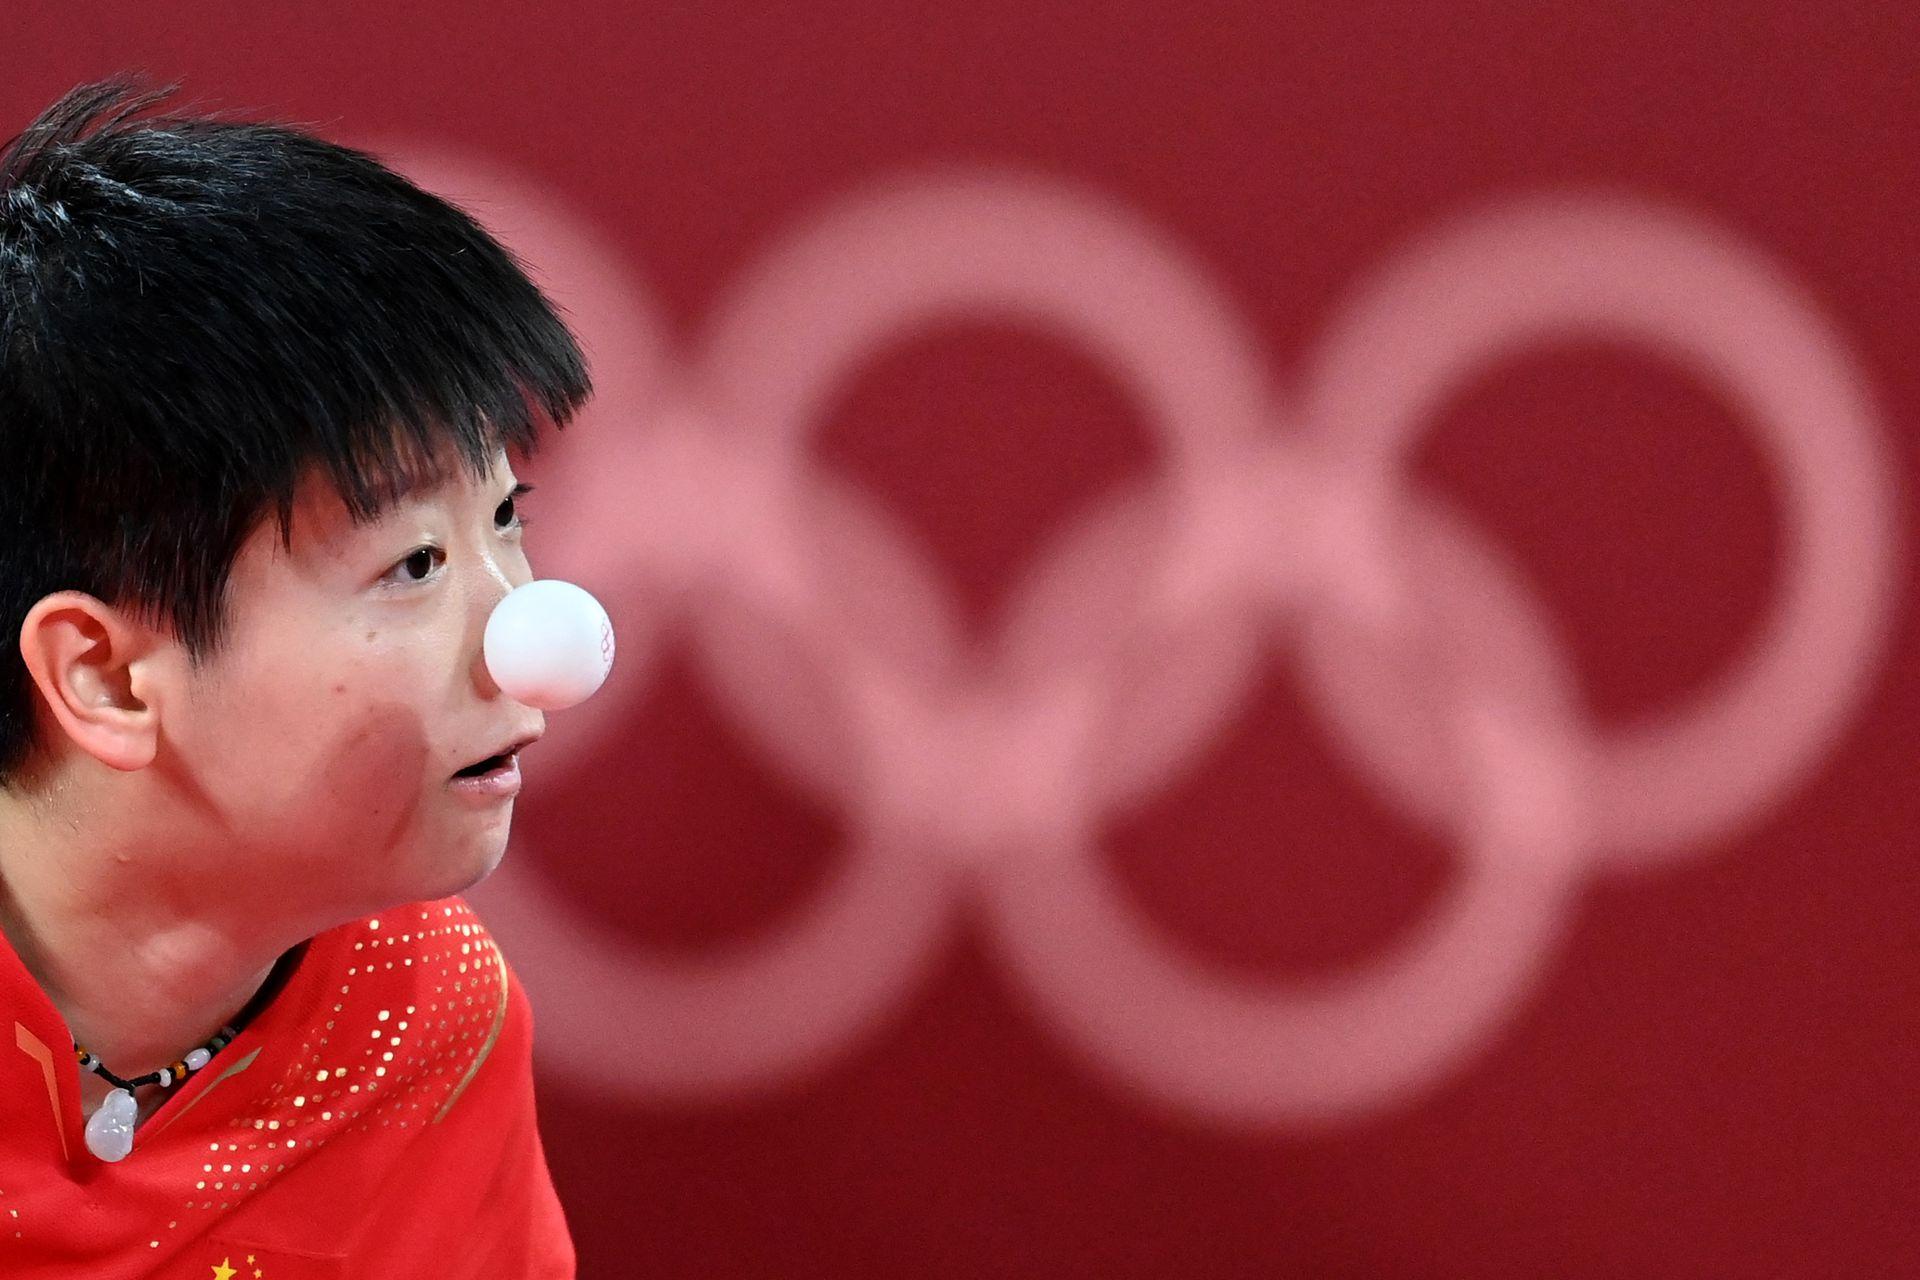 SUN China Sun Yingsha compite durante la semifinal de tenis de mesa de su equipo femenino